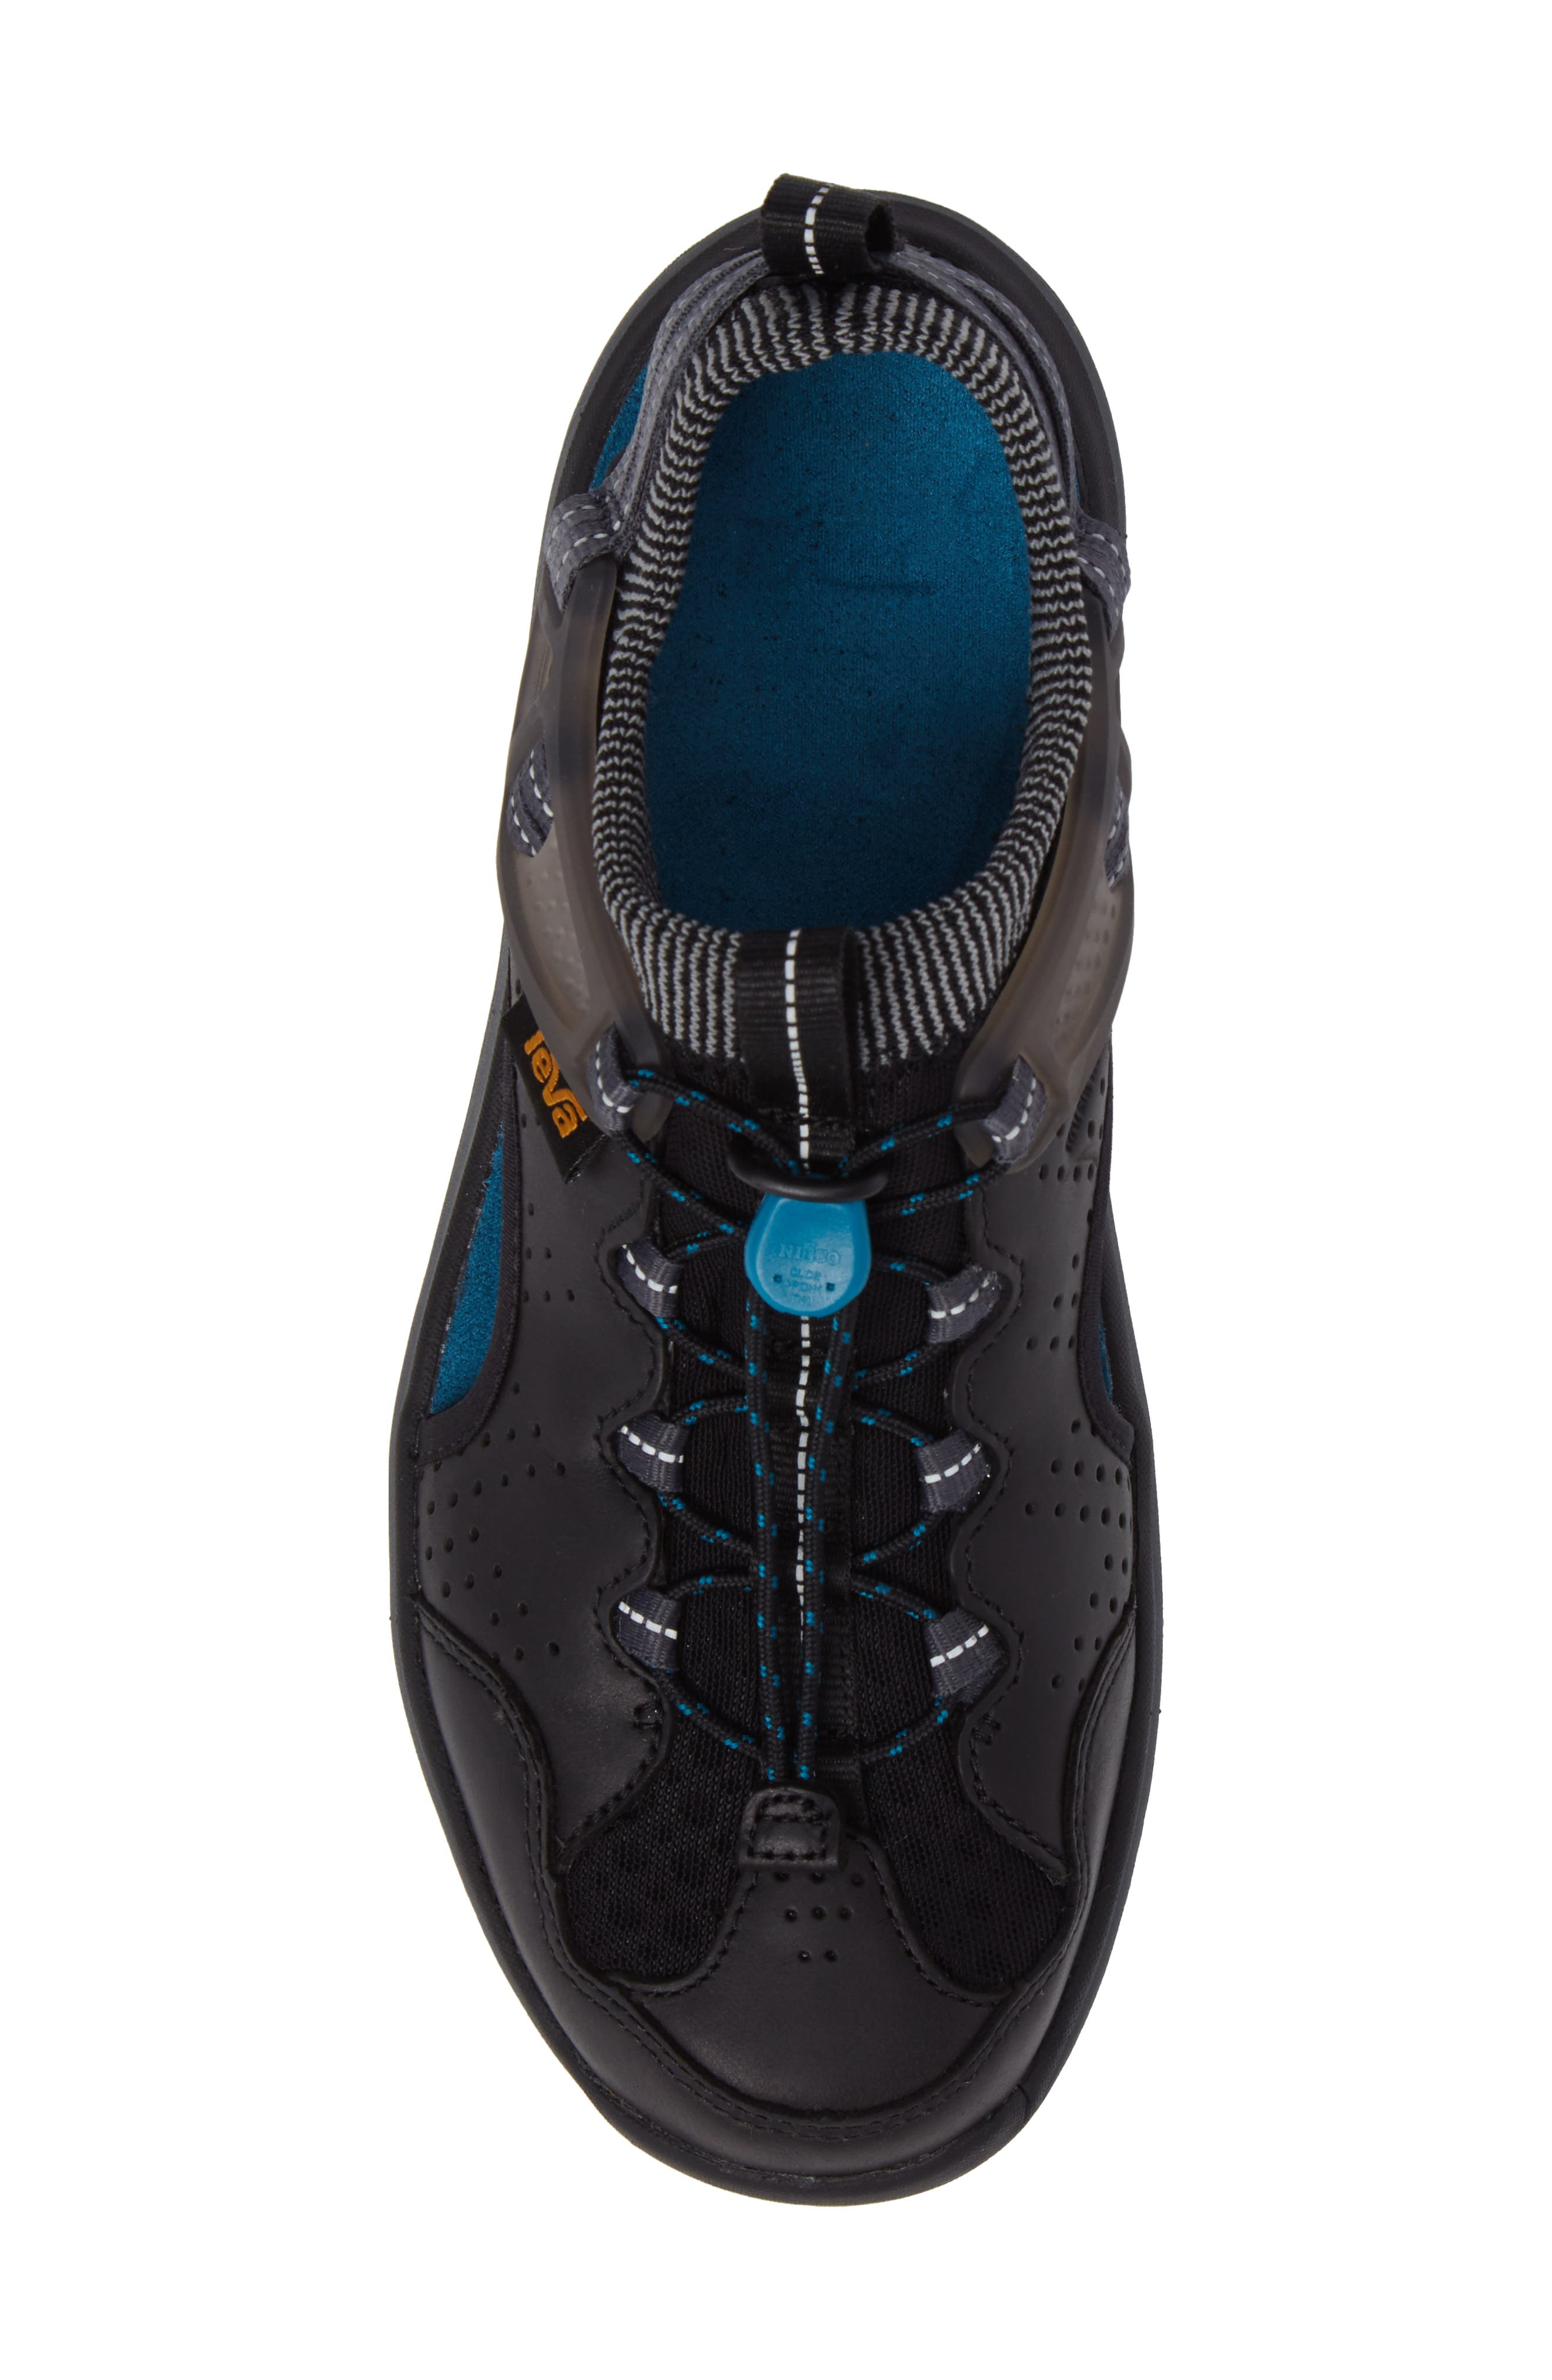 Terra Float Travel Sandal,                             Alternate thumbnail 5, color,                             Black Leather